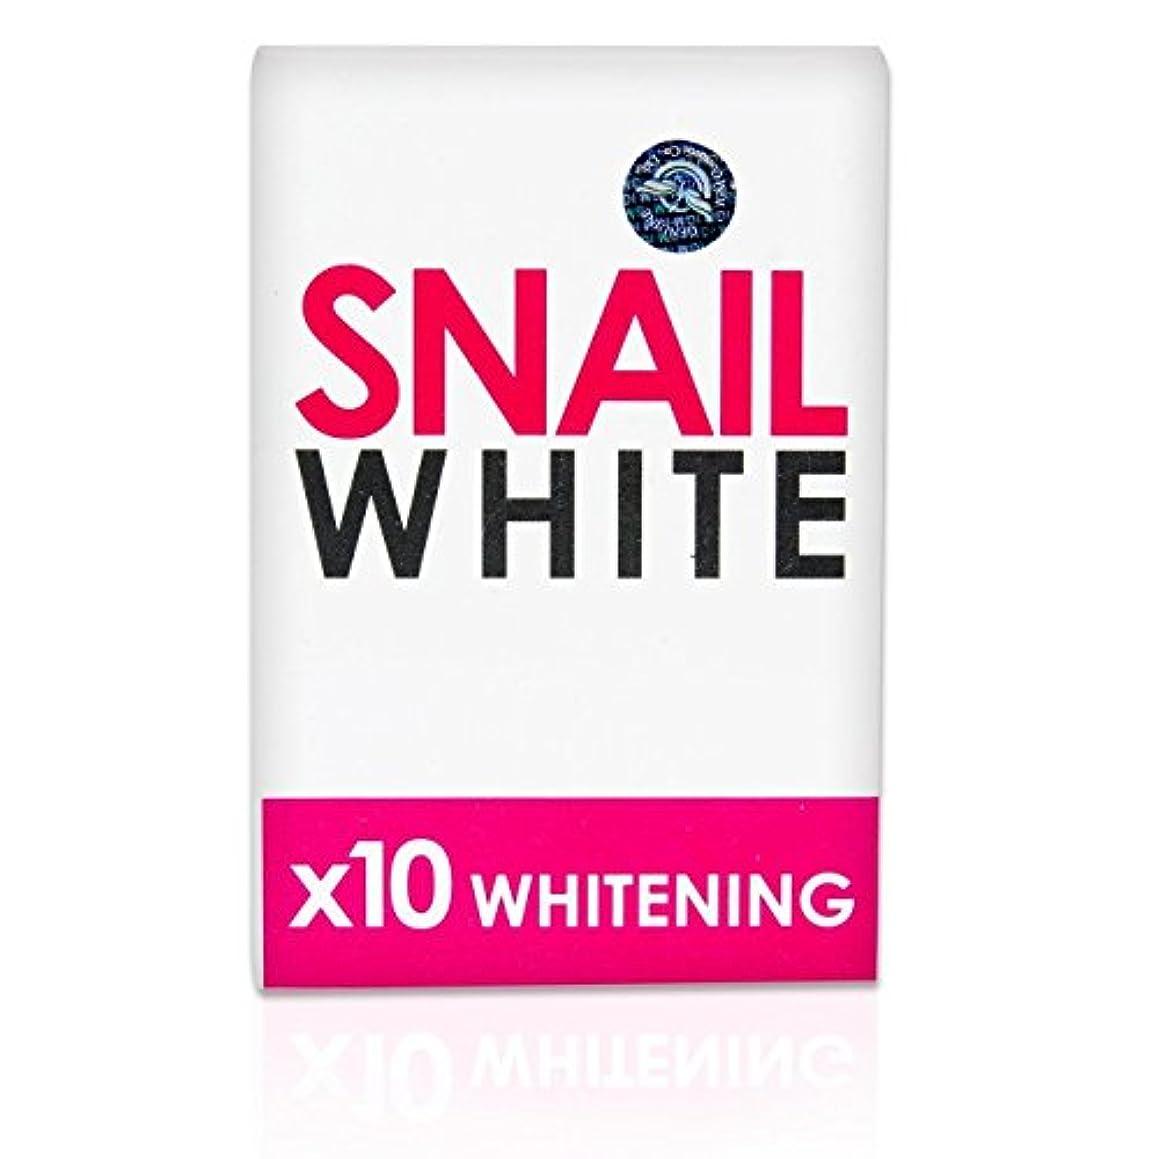 異形地質学評価可能Snail White Soap 10x Whitening Power 70g.,dark Spots Damage Skin Face & Body.(Good Services) by Snail